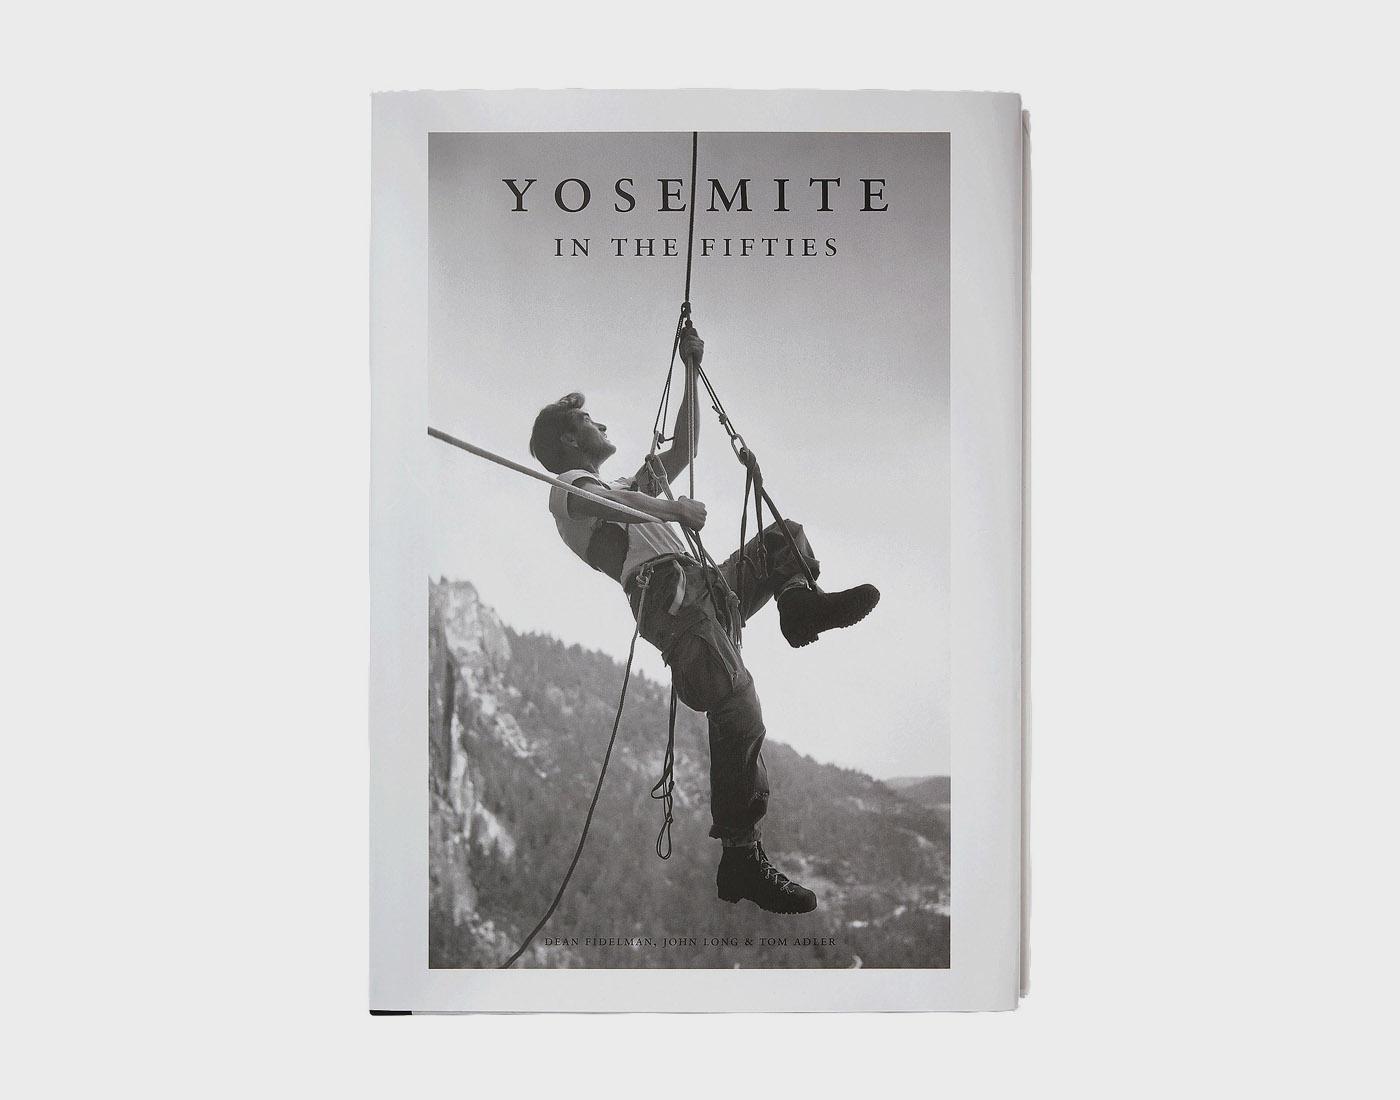 Patagonia Yosemite in the Fifties